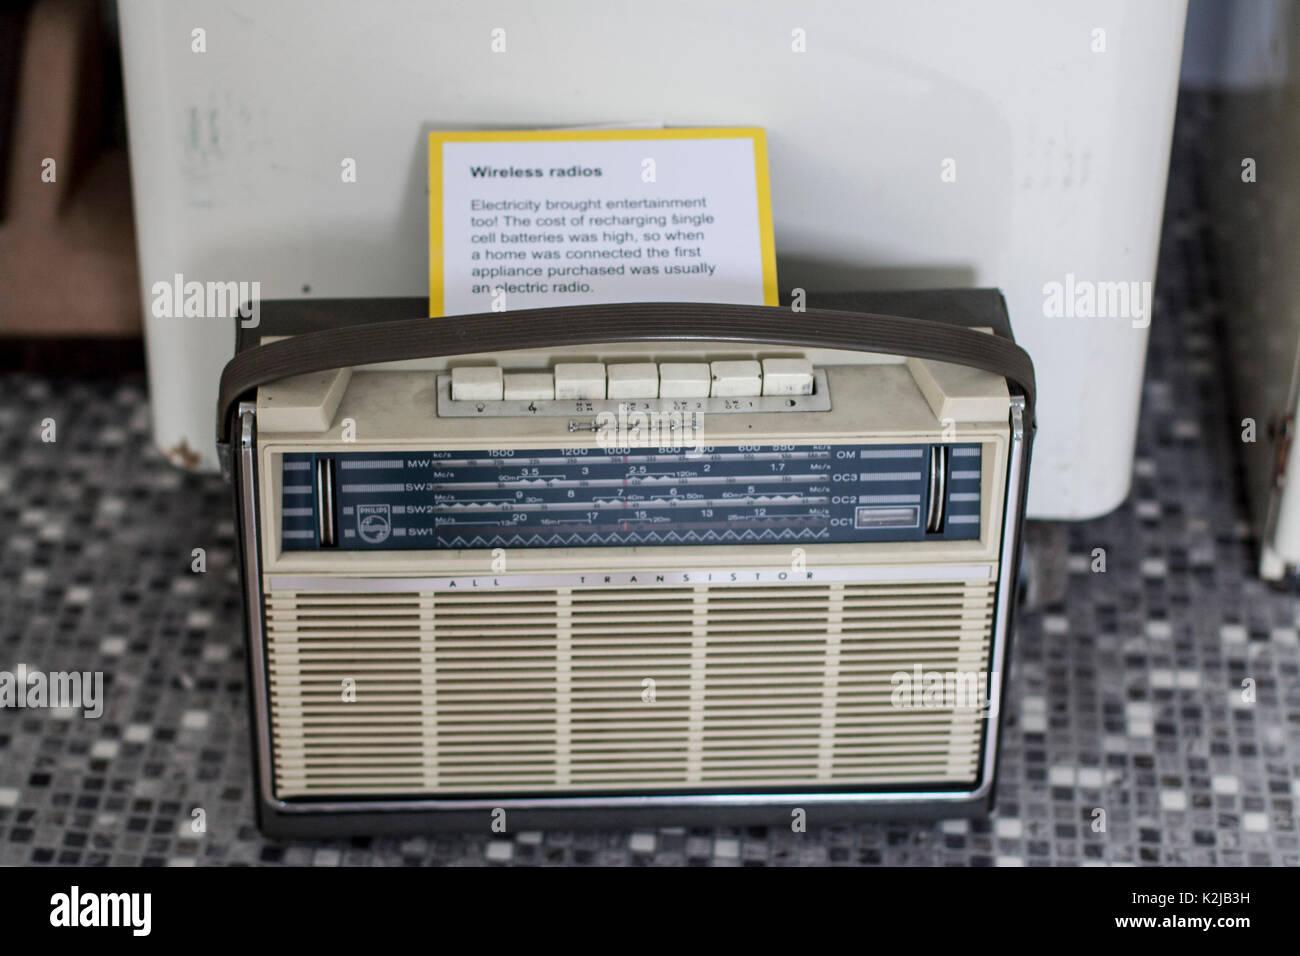 1950s Wireless Stock Photos & 1950s Wireless Stock Images - Alamy